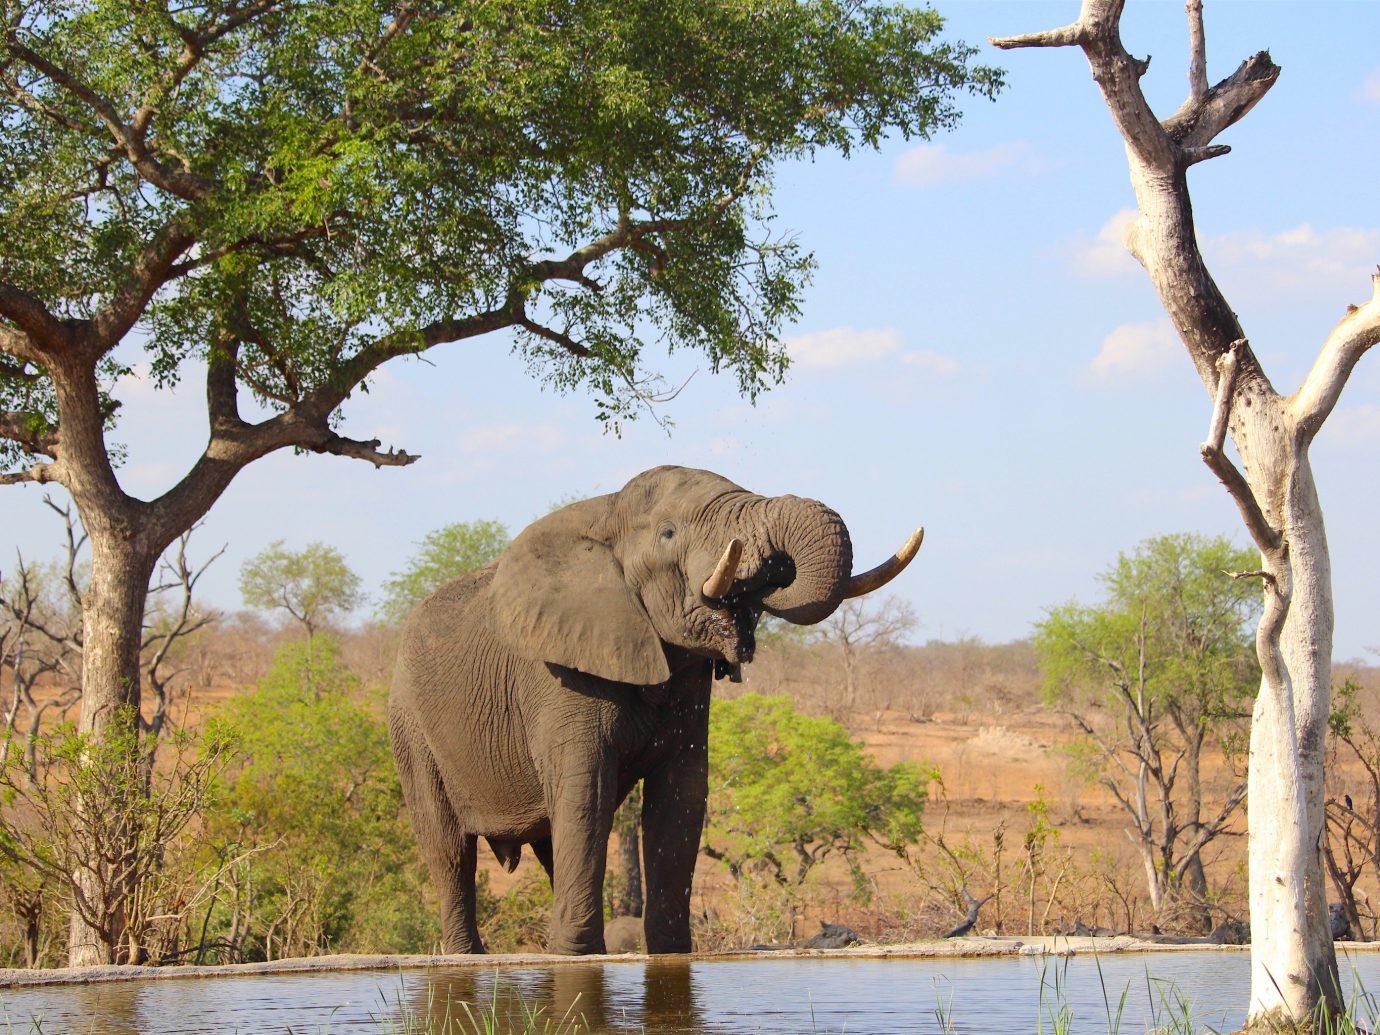 Outdoors + Adventure Safaris Trip Ideas tree elephant outdoor sky animal indian elephant grass mammal Wildlife fauna elephants and mammoths walking standing savanna african elephant Safari outdoor recreation zoo trunk Adventure dirt